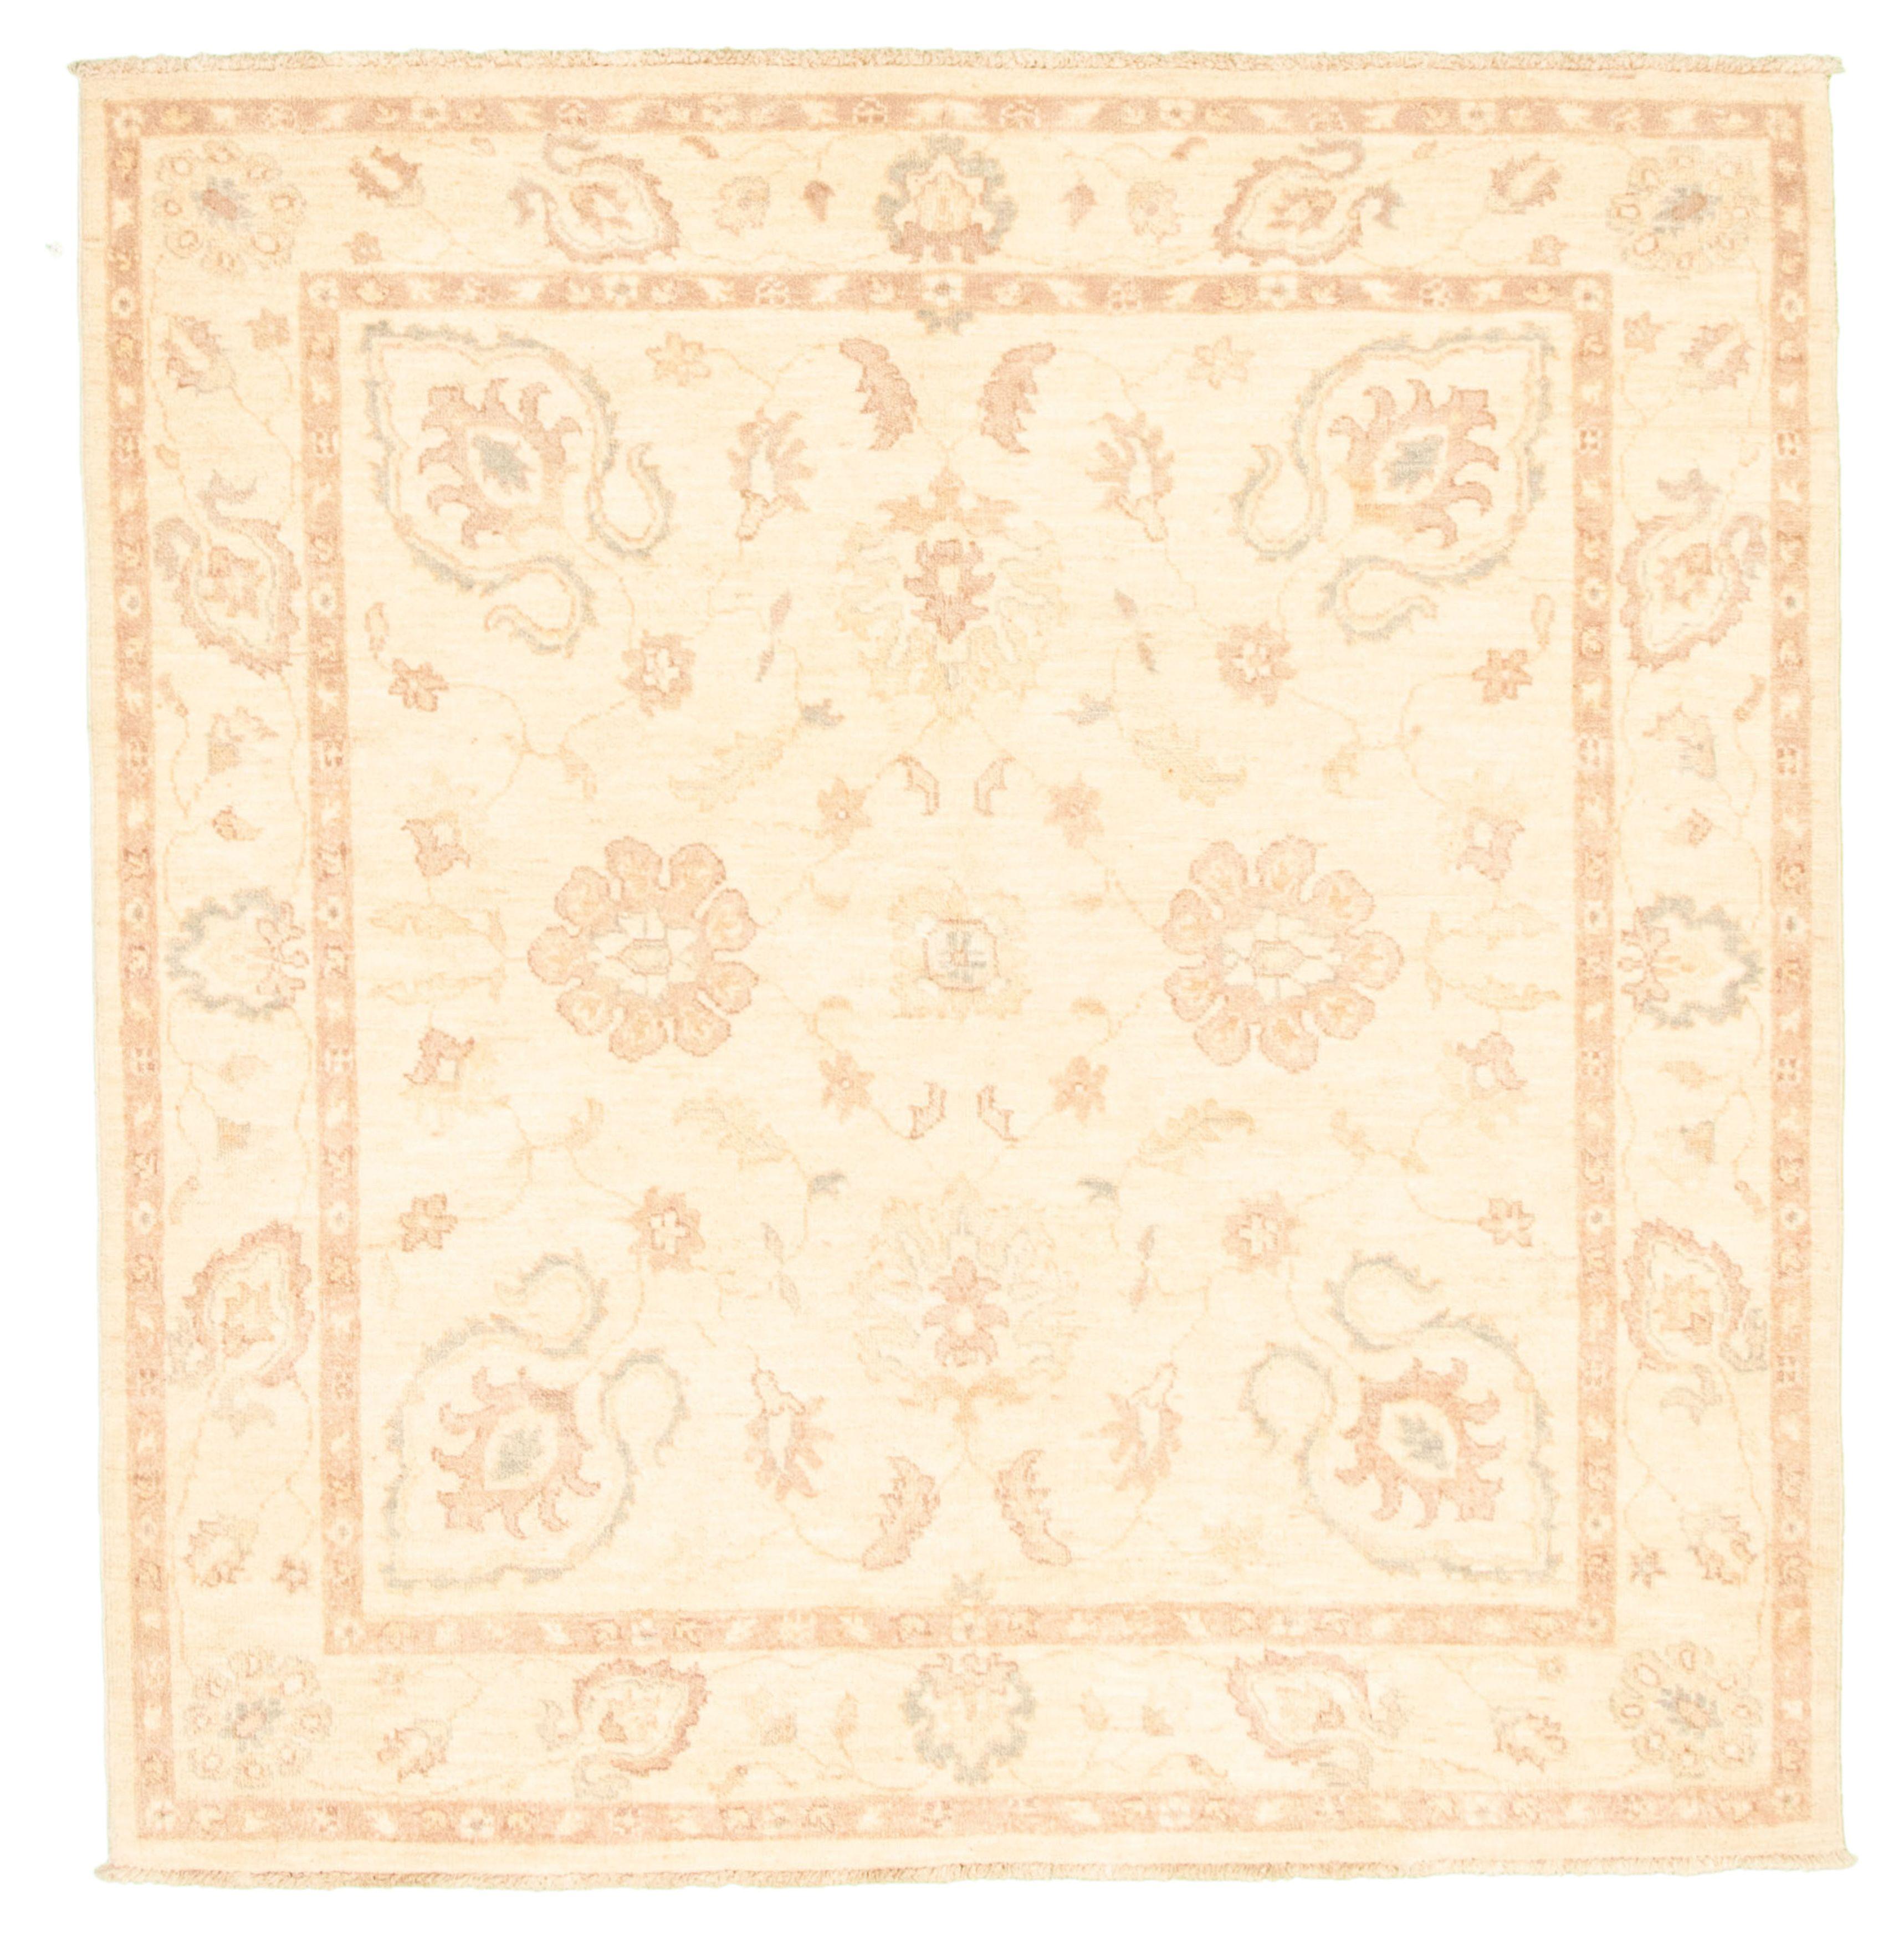 "Hand-knotted Peshawar Oushak Cream Wool Rug 5'3"" x 5'5"" Size: 5'3"" x 5'5"""